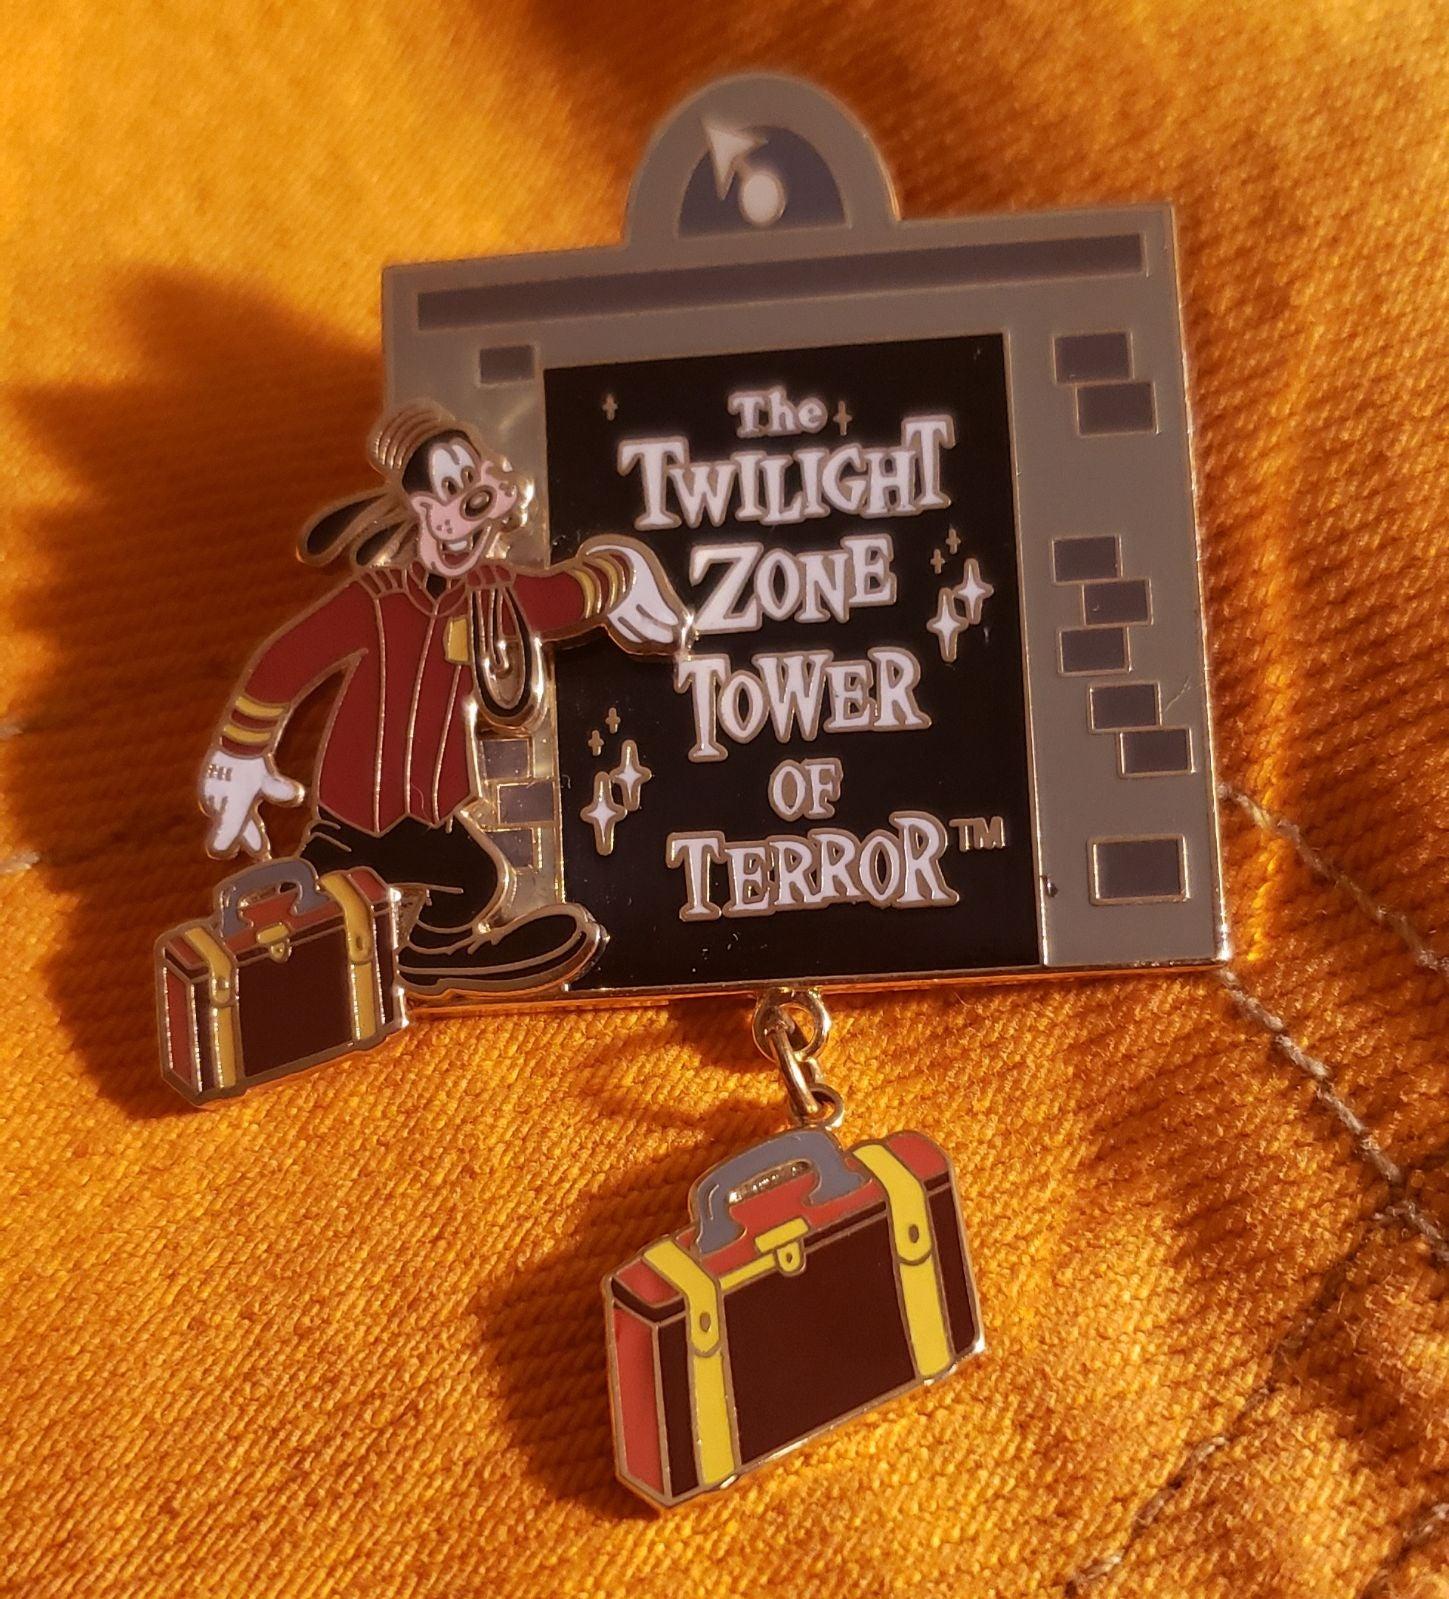 Goofy Twilight Zone Tower of Terror Pin